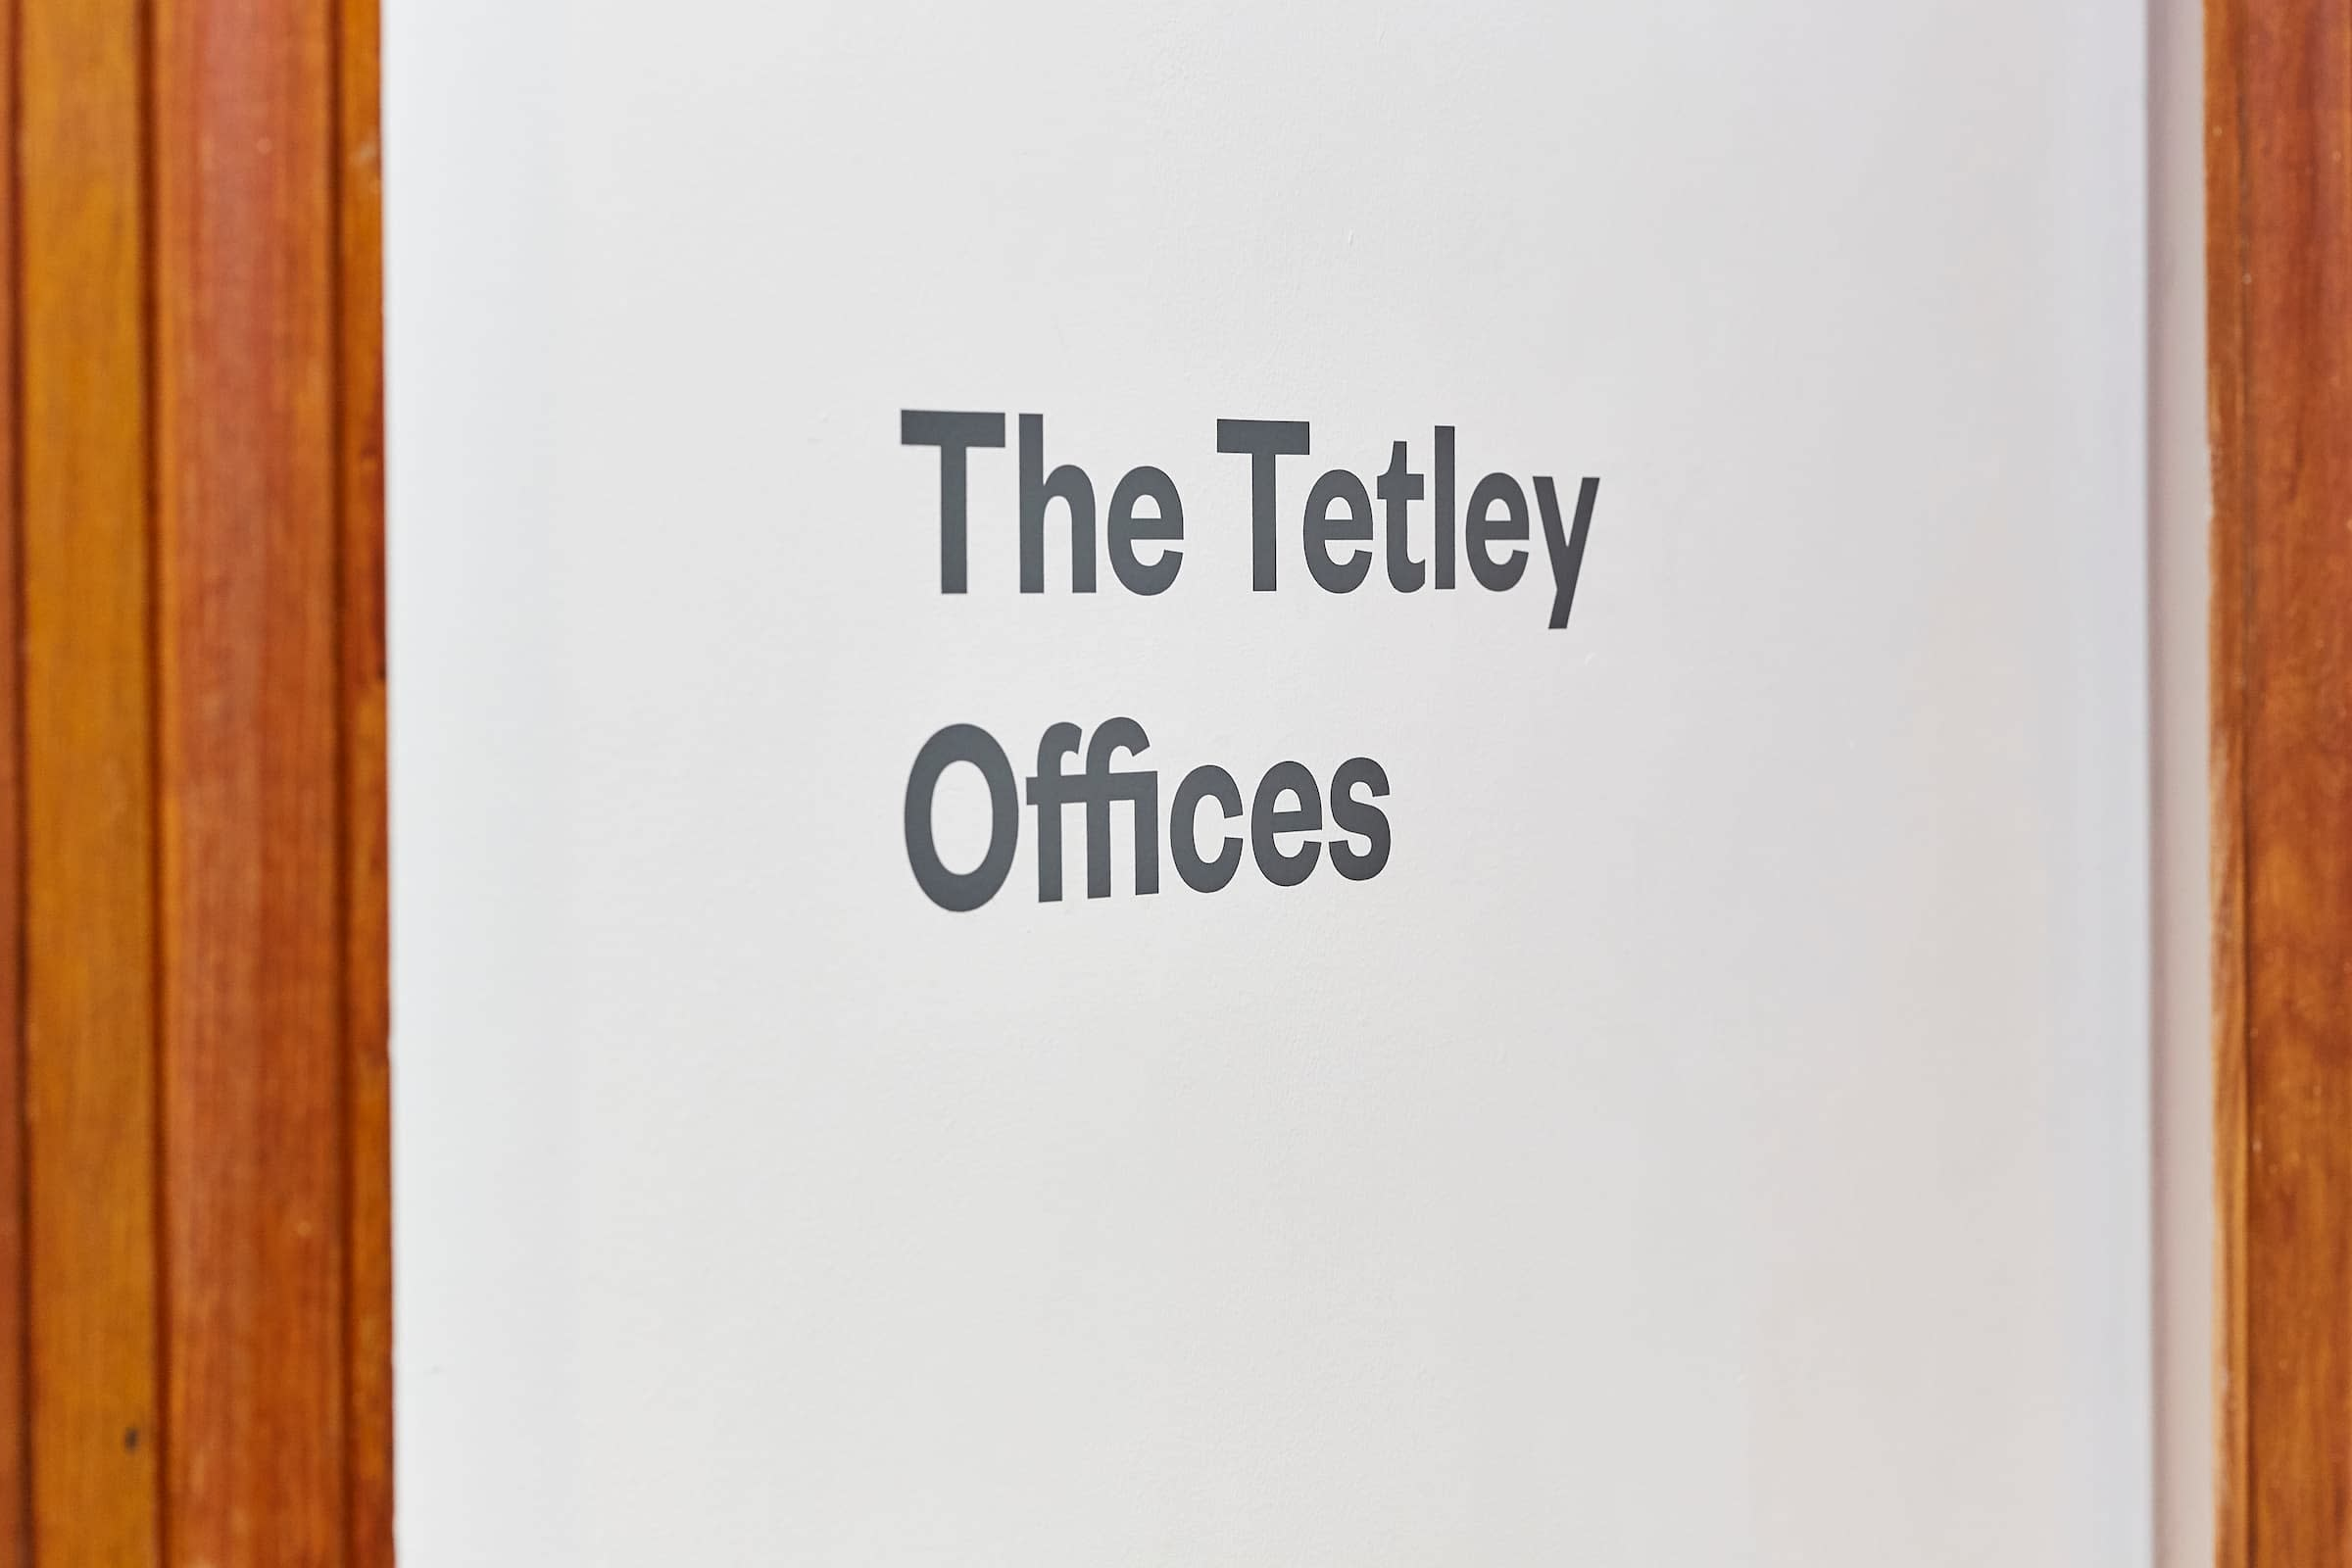 saul studio — The Tetley